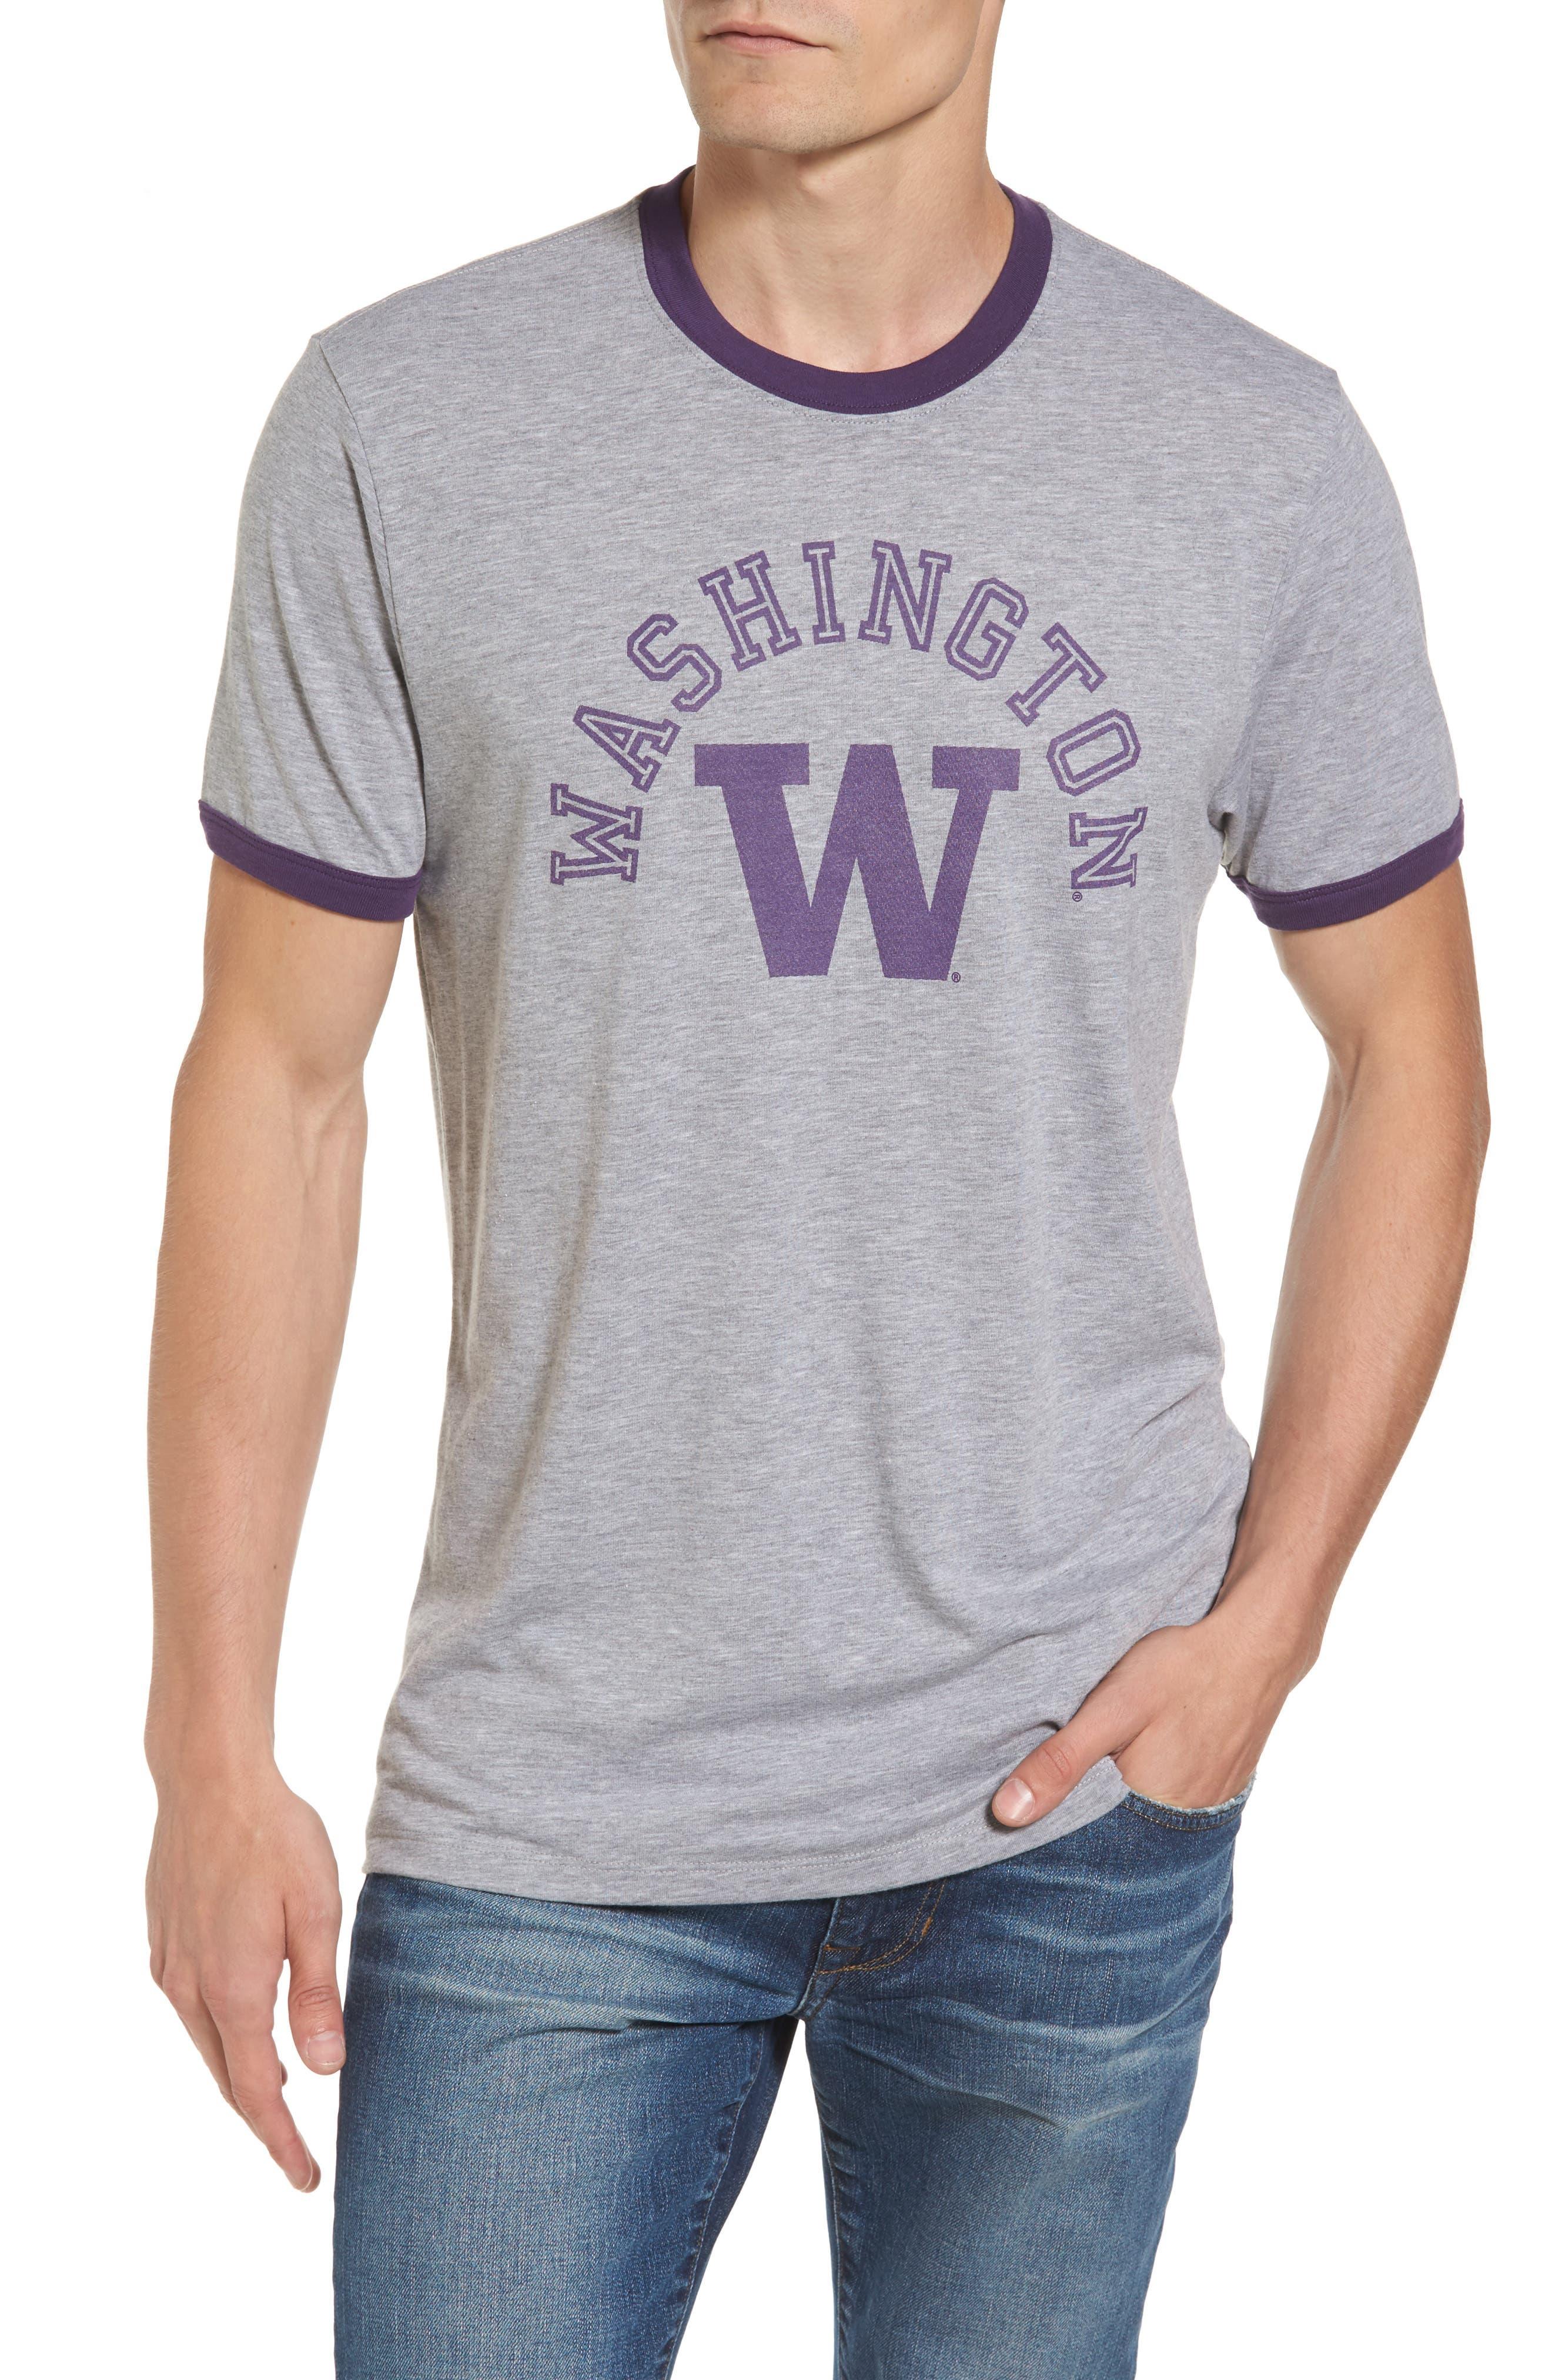 Alternate Image 1 Selected - '47 University of Washington Huskies Ringer T-Shirt